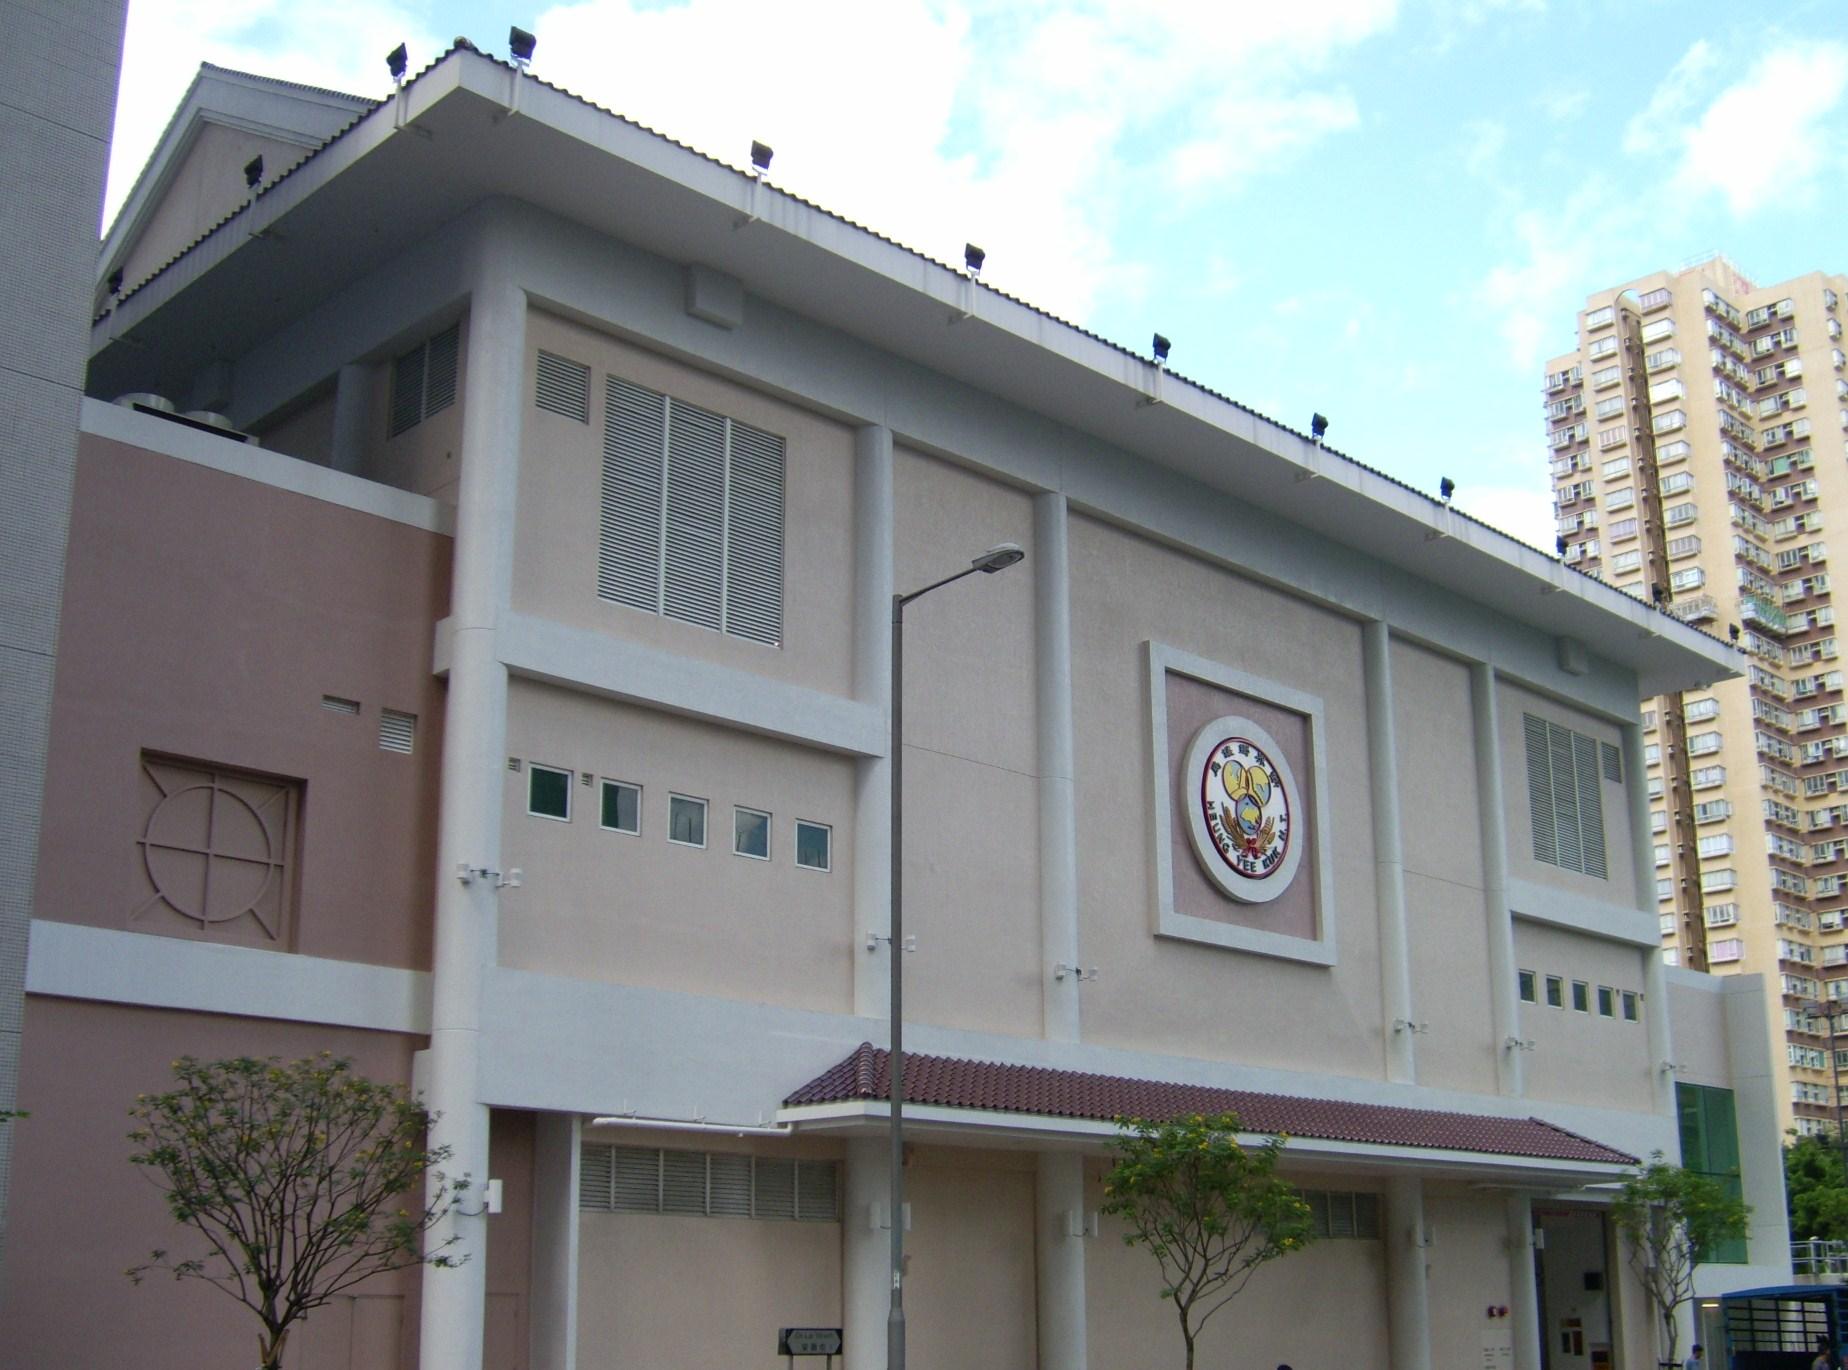 New Heung Yee Kuk Headquarter, On Muk Street, Area 11, Shek Mun, Shatin